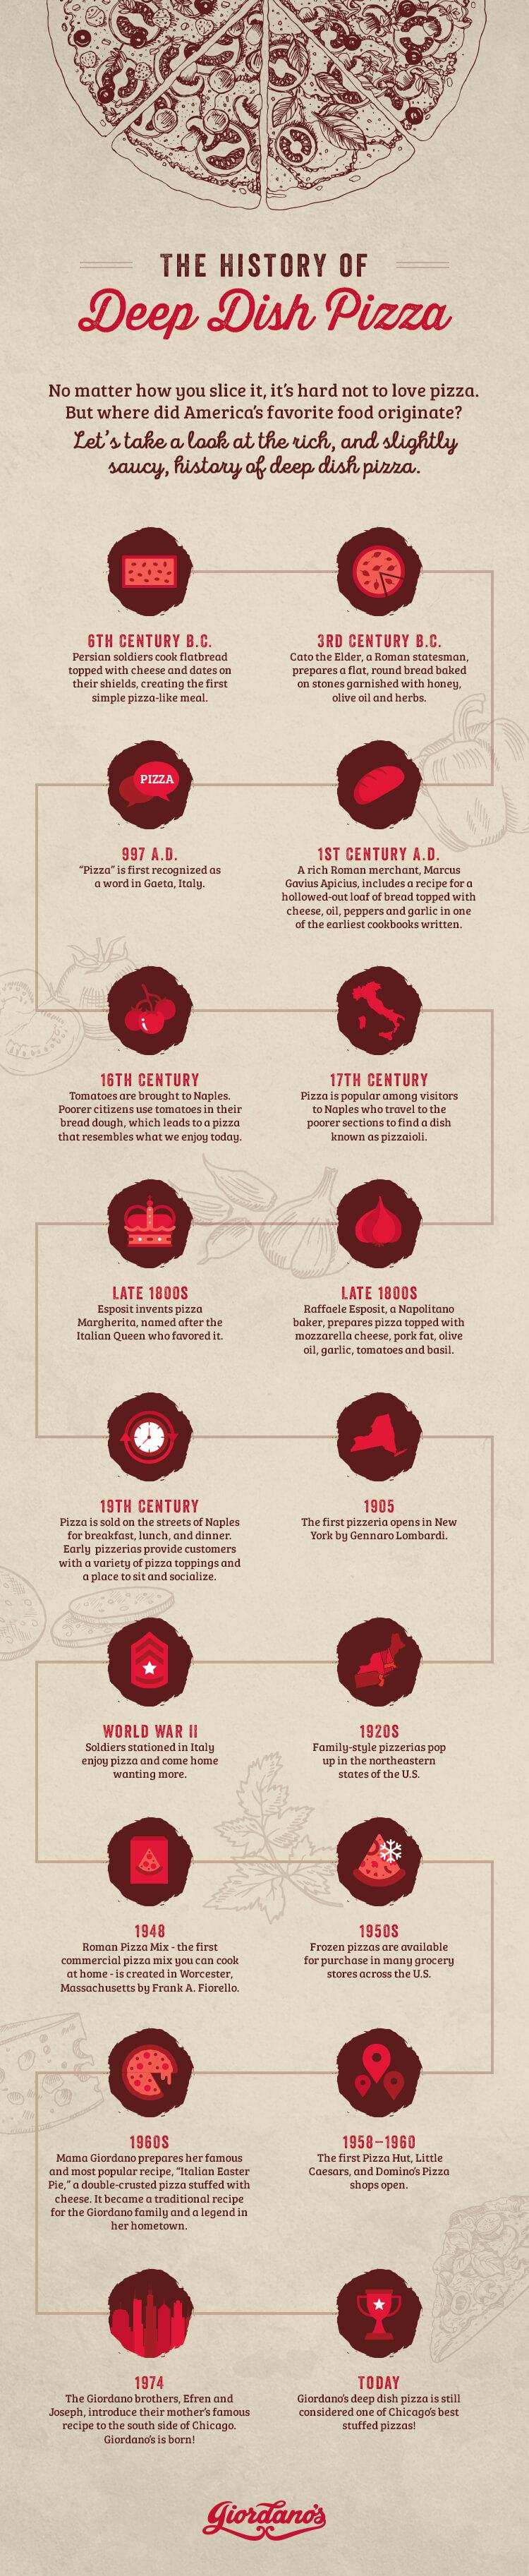 History of Deep Dish Pizza